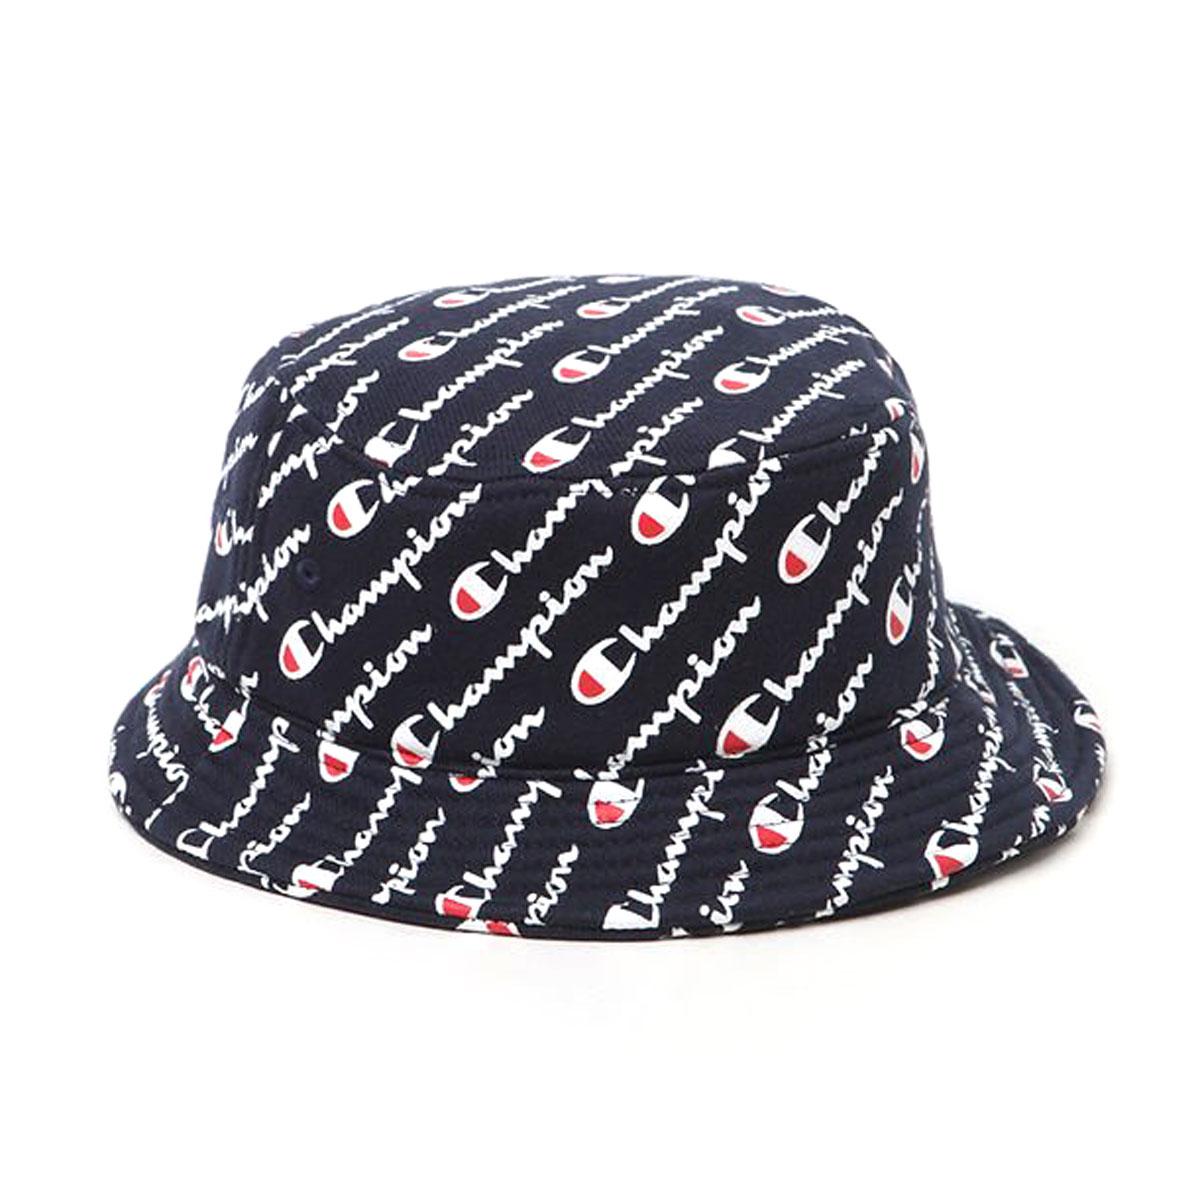 35b702e60df チャンピオン CHAMPION 正規品 帽子 ハット REVERSE WEAVE BUCKET HAT ...